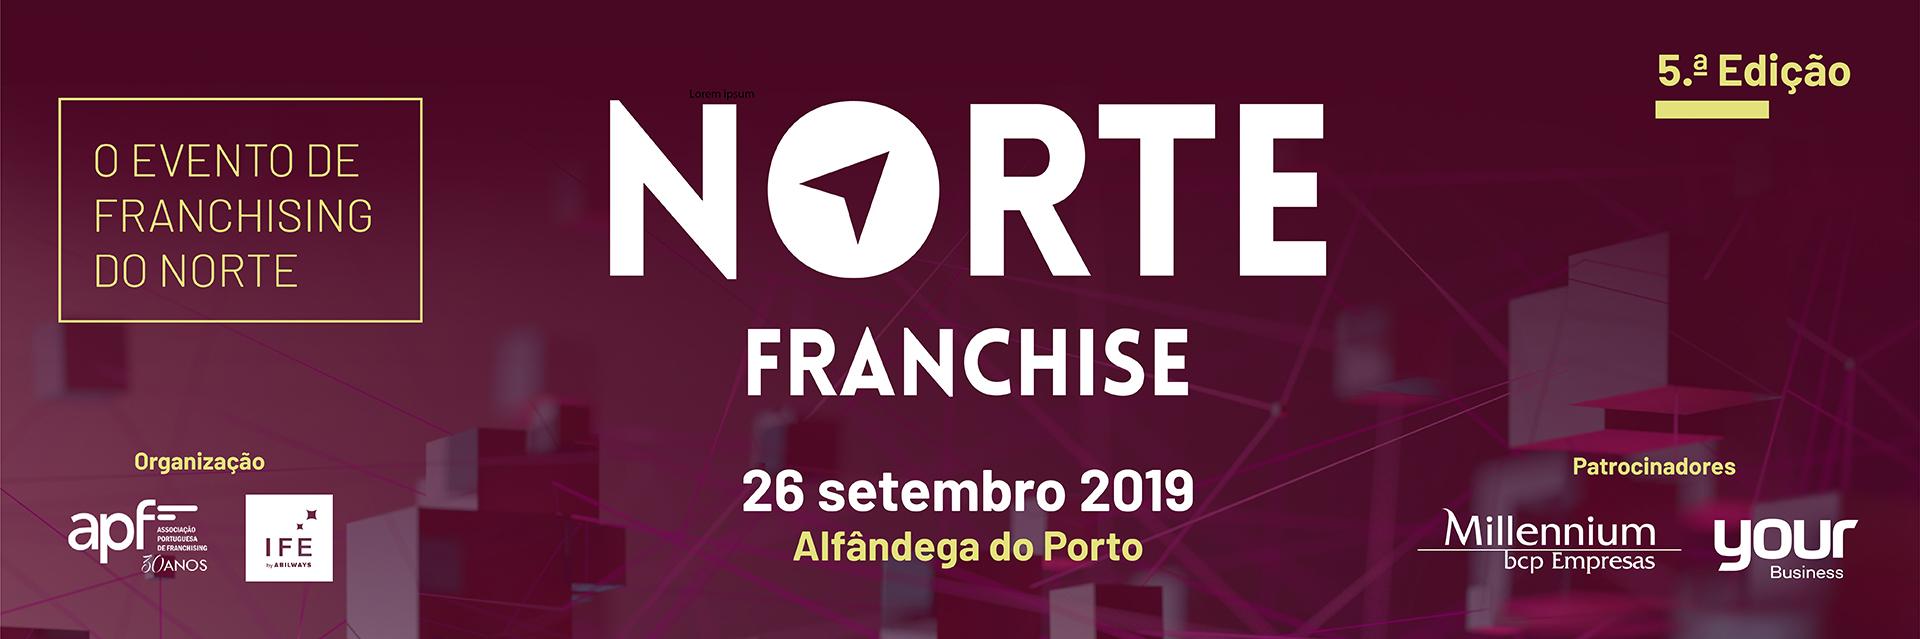 Norte Franchise 2019